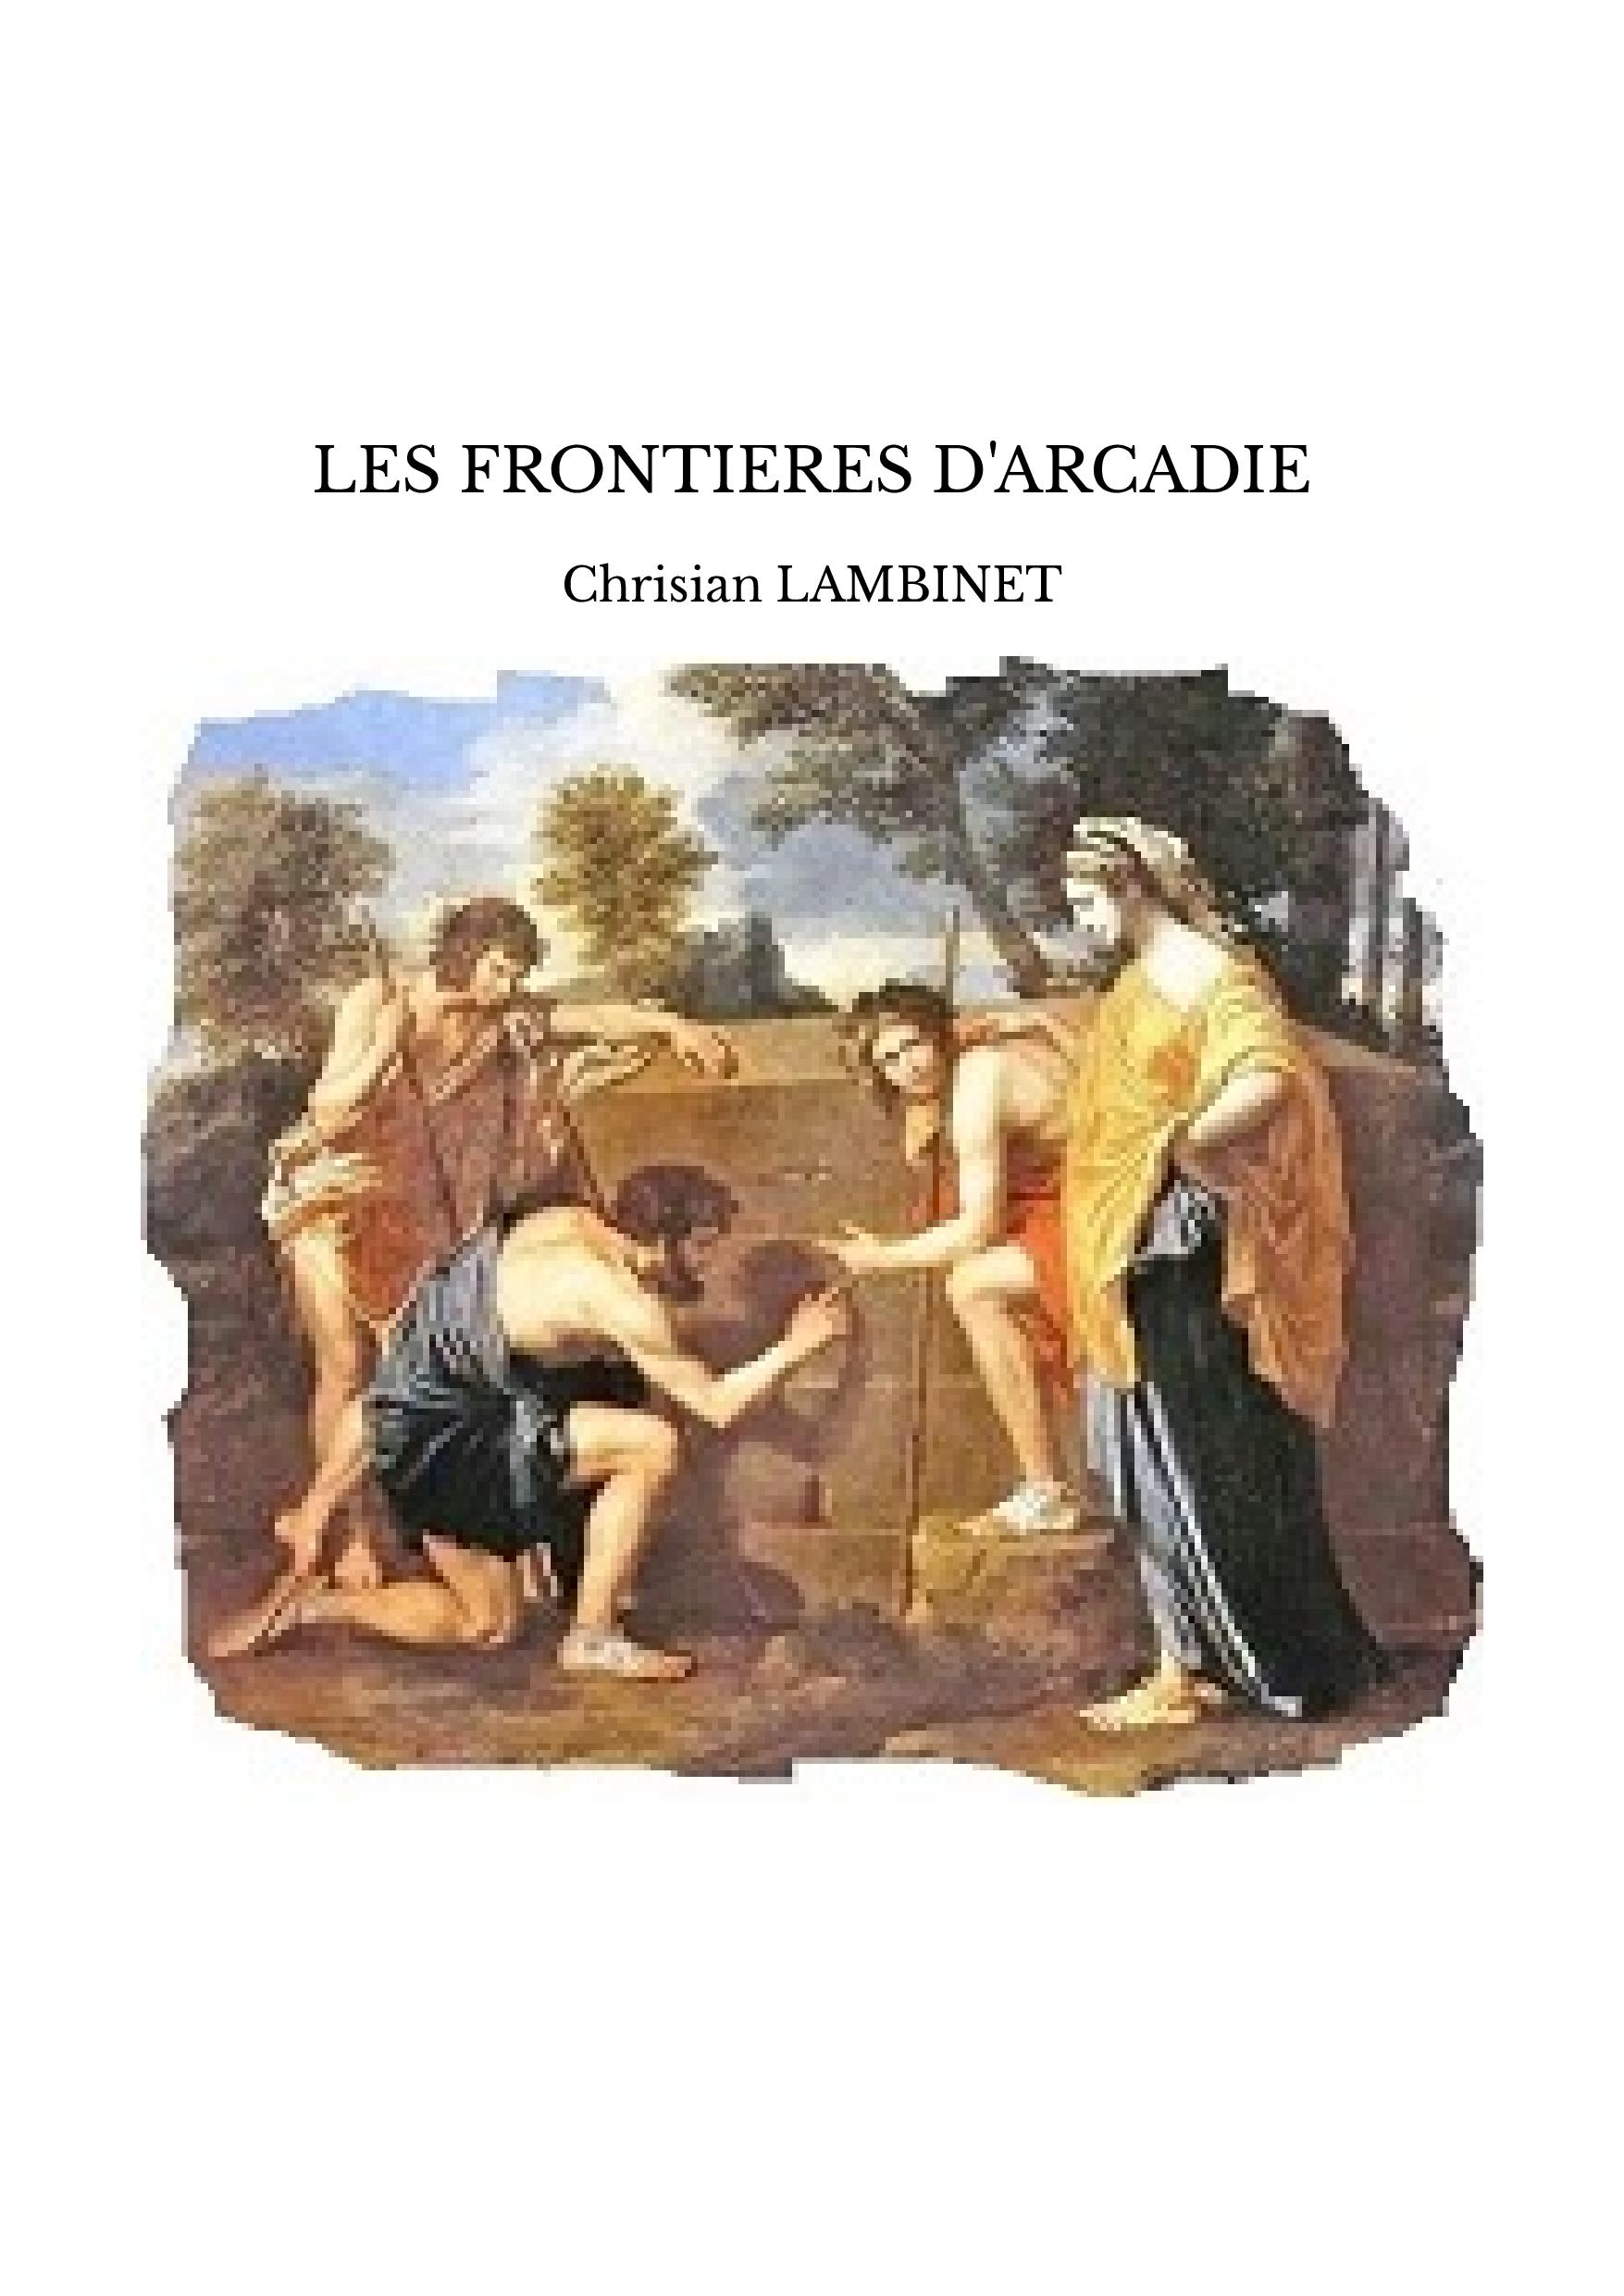 LES FRONTIERES D'ARCADIE